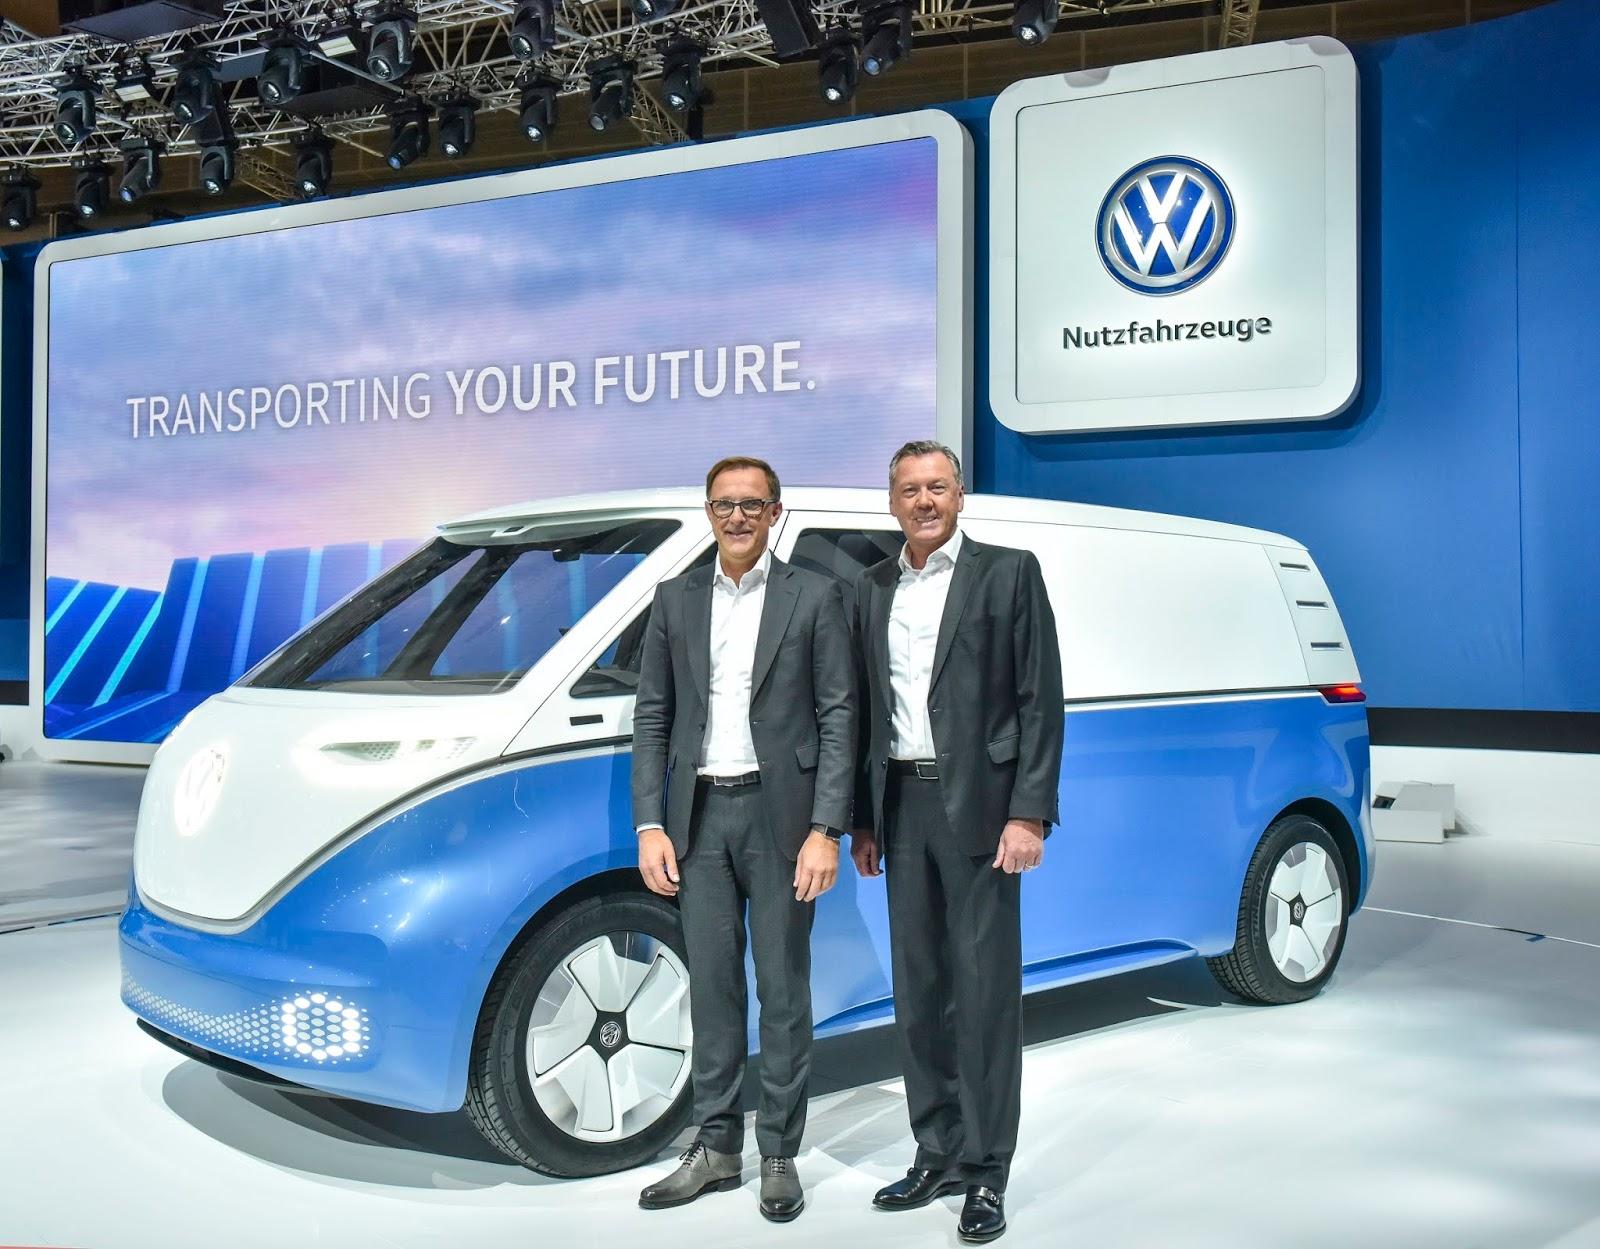 VOLKSWAGEN2BI.D.2BBUZZ2BCARGO2B 2B25CE25A025CE25A125CE259525CE259C25CE259925CE259525CE25A125CE25912B25CE25A325CE25A425CE259F2B25CE259125CE259D25CE259D25CE259F25CE259225CE259525CE25A125CE259F Αυτό είναι το νέο, ηλεκτρικό βαν της Volkswagen Electric cars, Volkswagen, VW Transporter, Επαγγελματικά